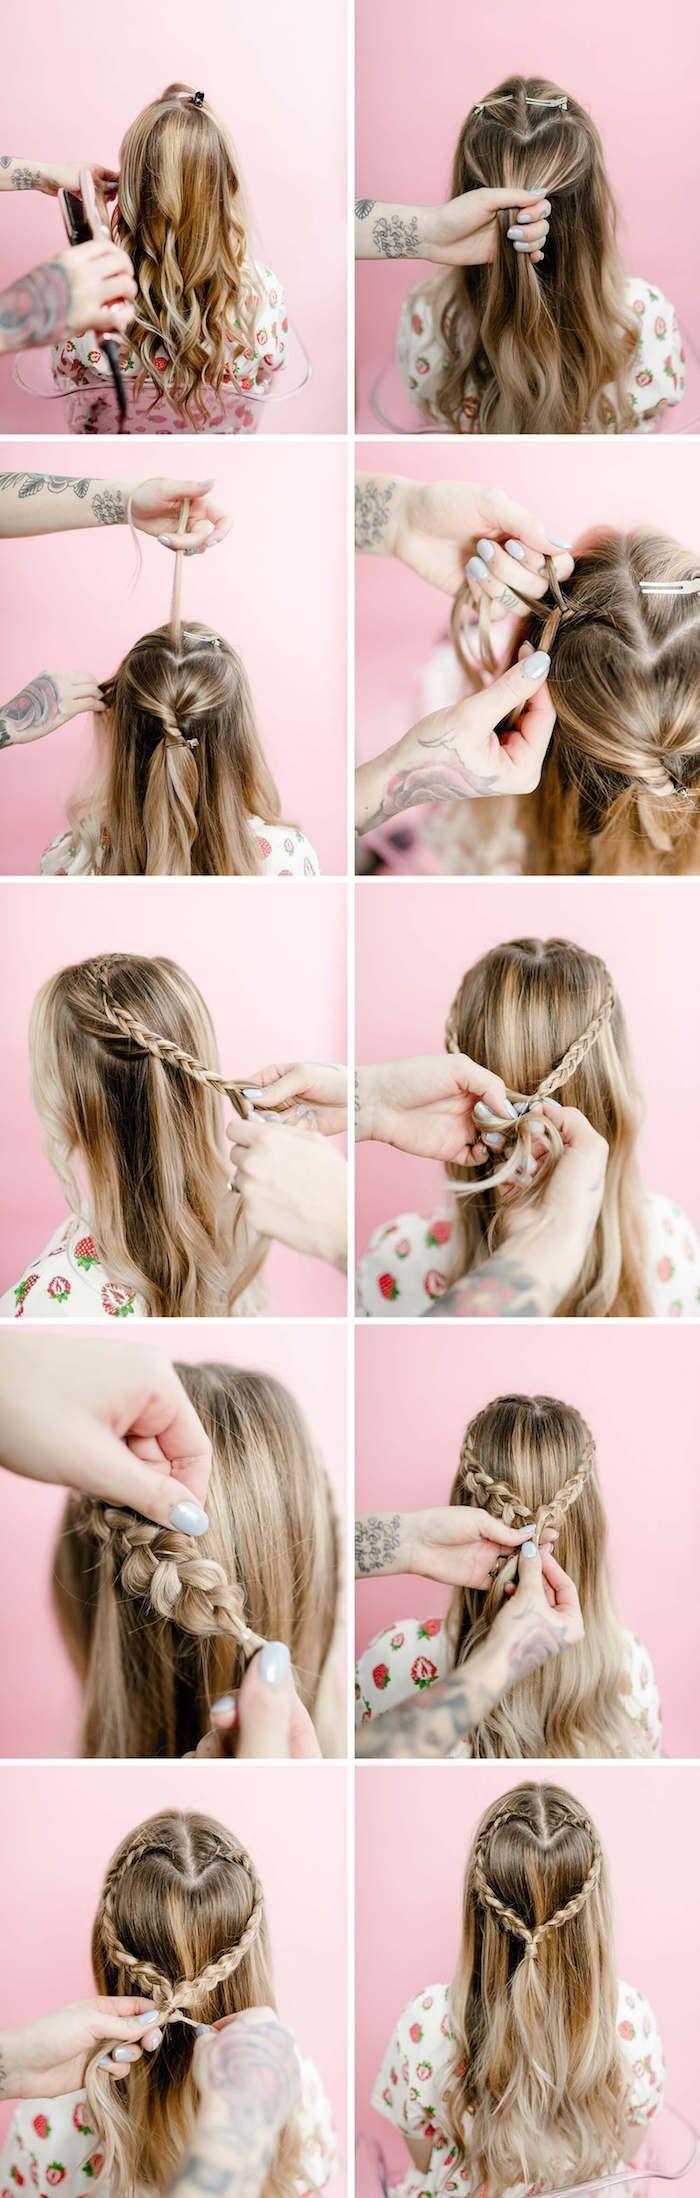 1001 Inspiring Ideas For Simple Self Made Braids Braids Hairstyle Hairstyles Ideas Inspiring Selfmade Sim Braided Hairstyles Heart Hair Hair Styles